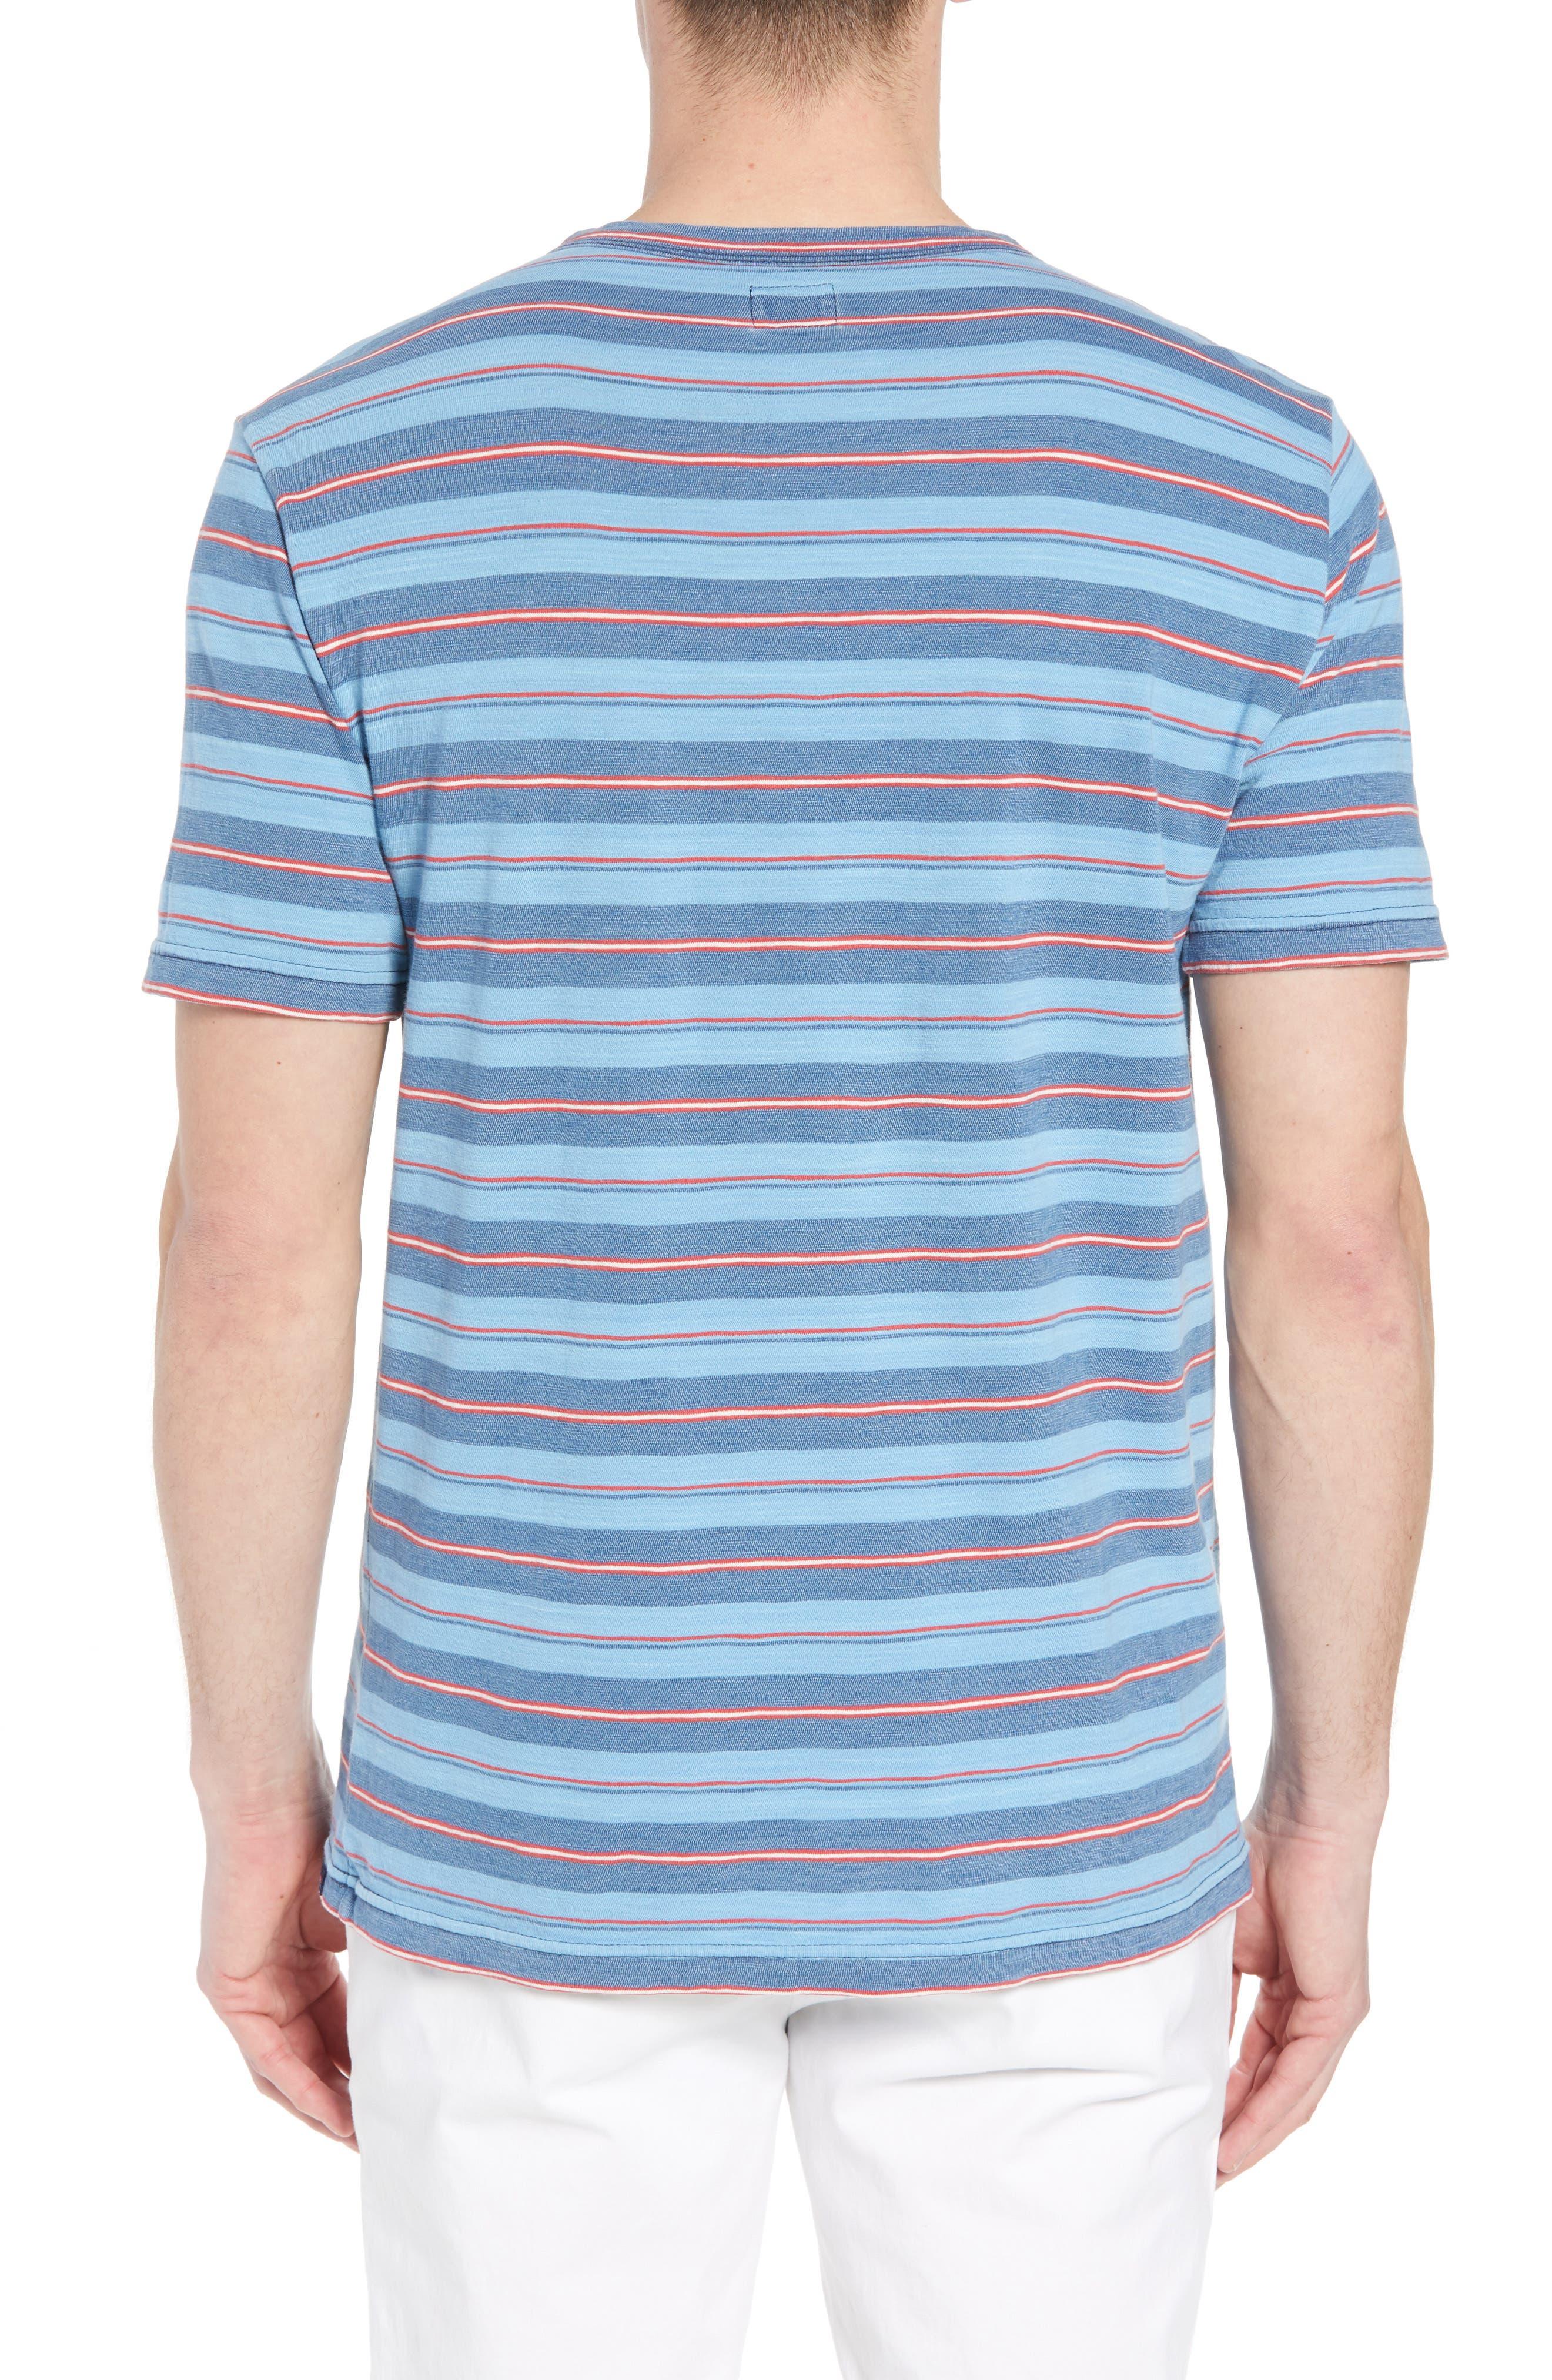 Vintage Stripe Pocket T-Shirt,                             Alternate thumbnail 2, color,                             Indigo Multi